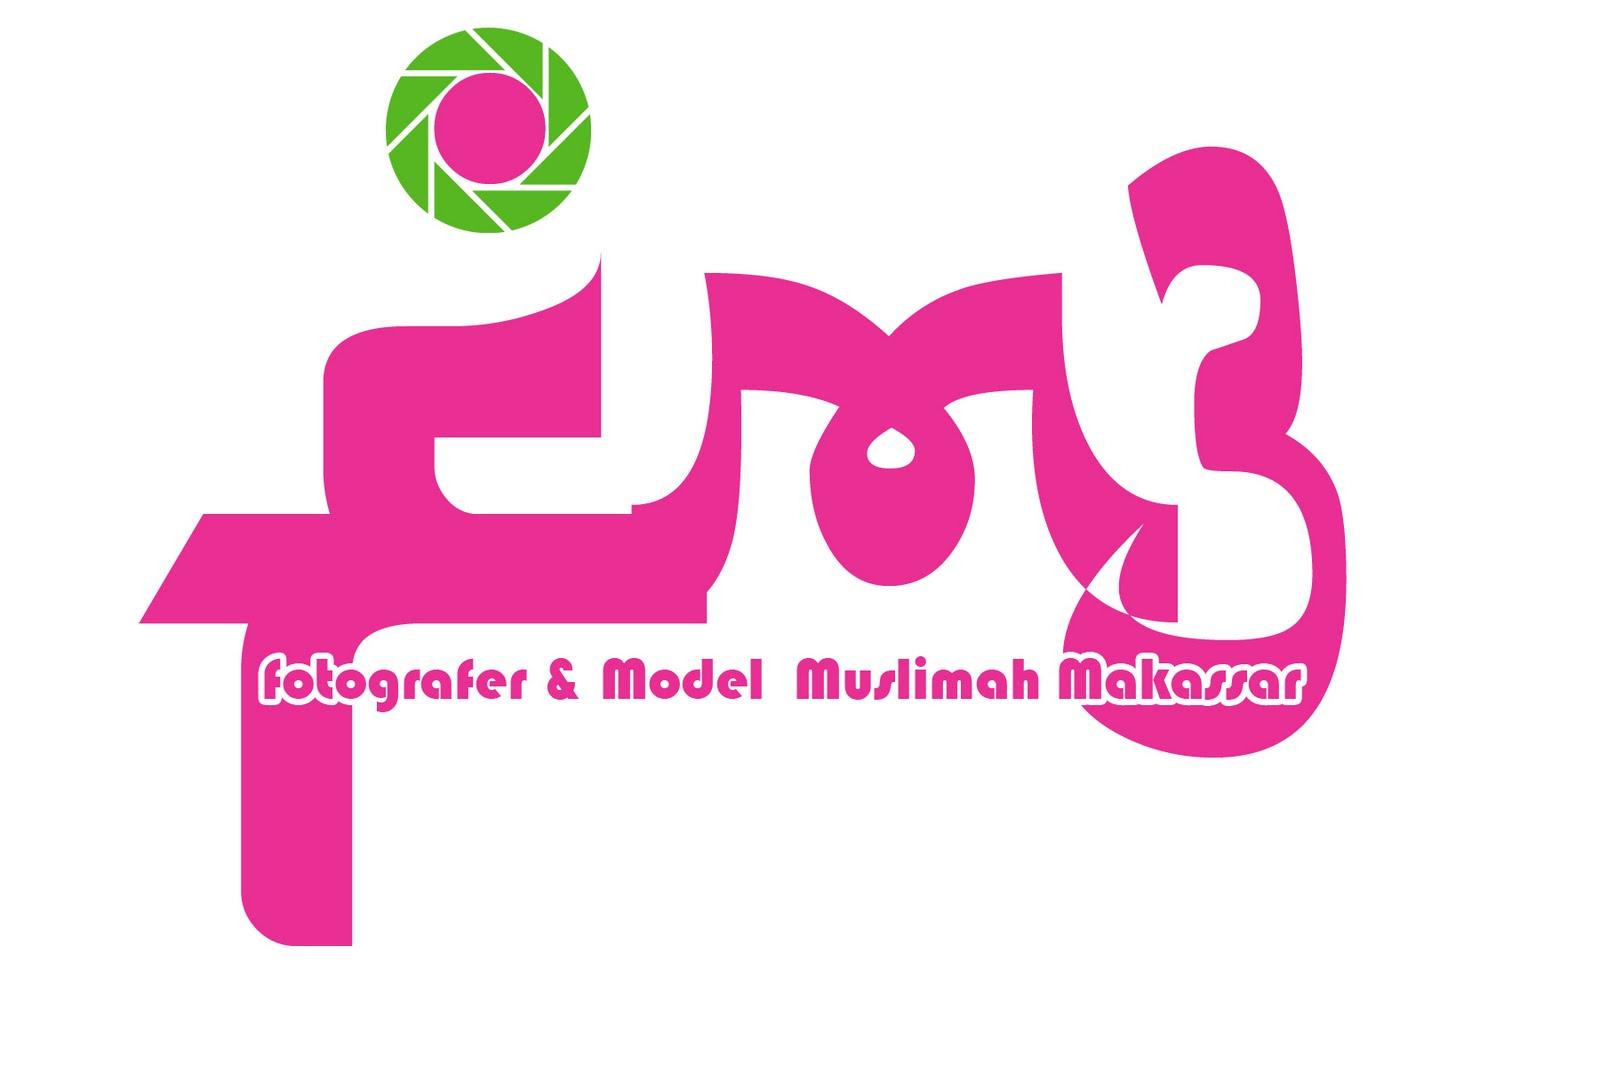 Fotografer & Model Muslimah Makassar